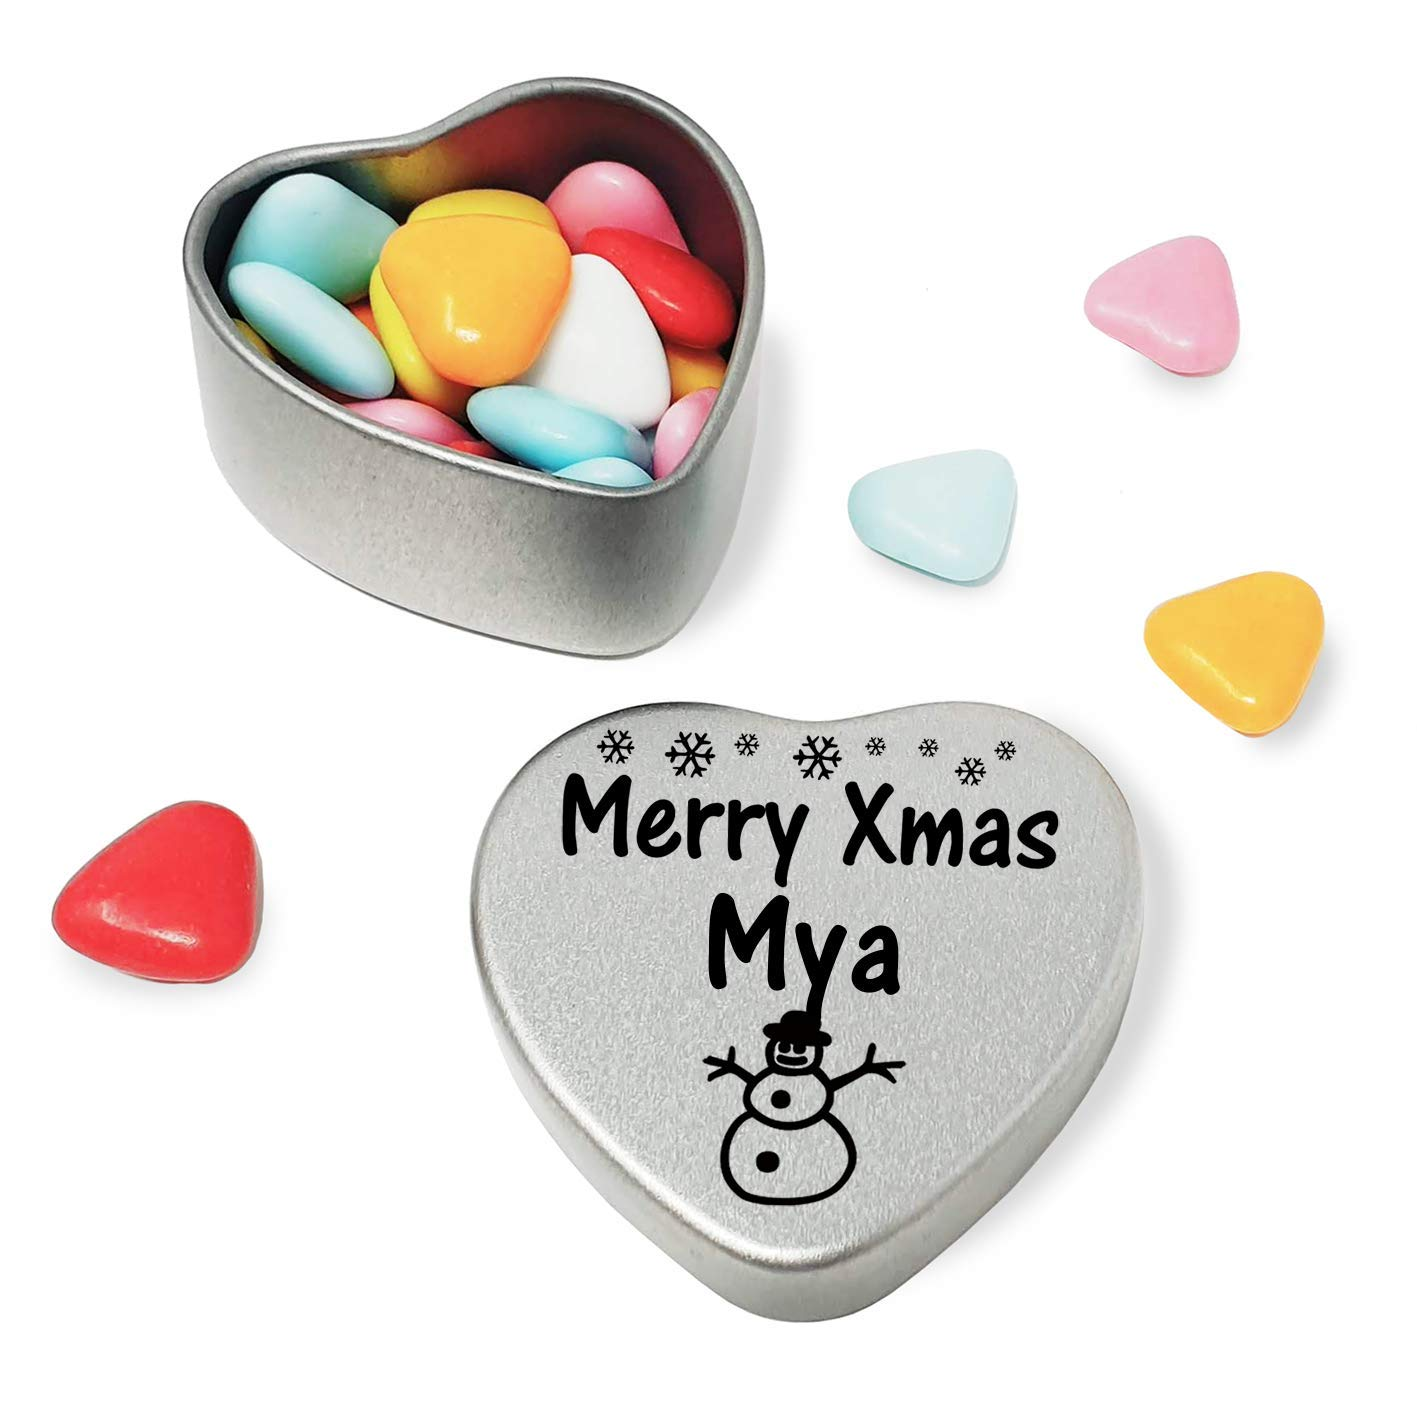 Merry Xmas Mya Heart Shaped Mini Tin Gift filled with mini coloured chocolates perfect card alternative for Mya Fun Festive Snowman Design